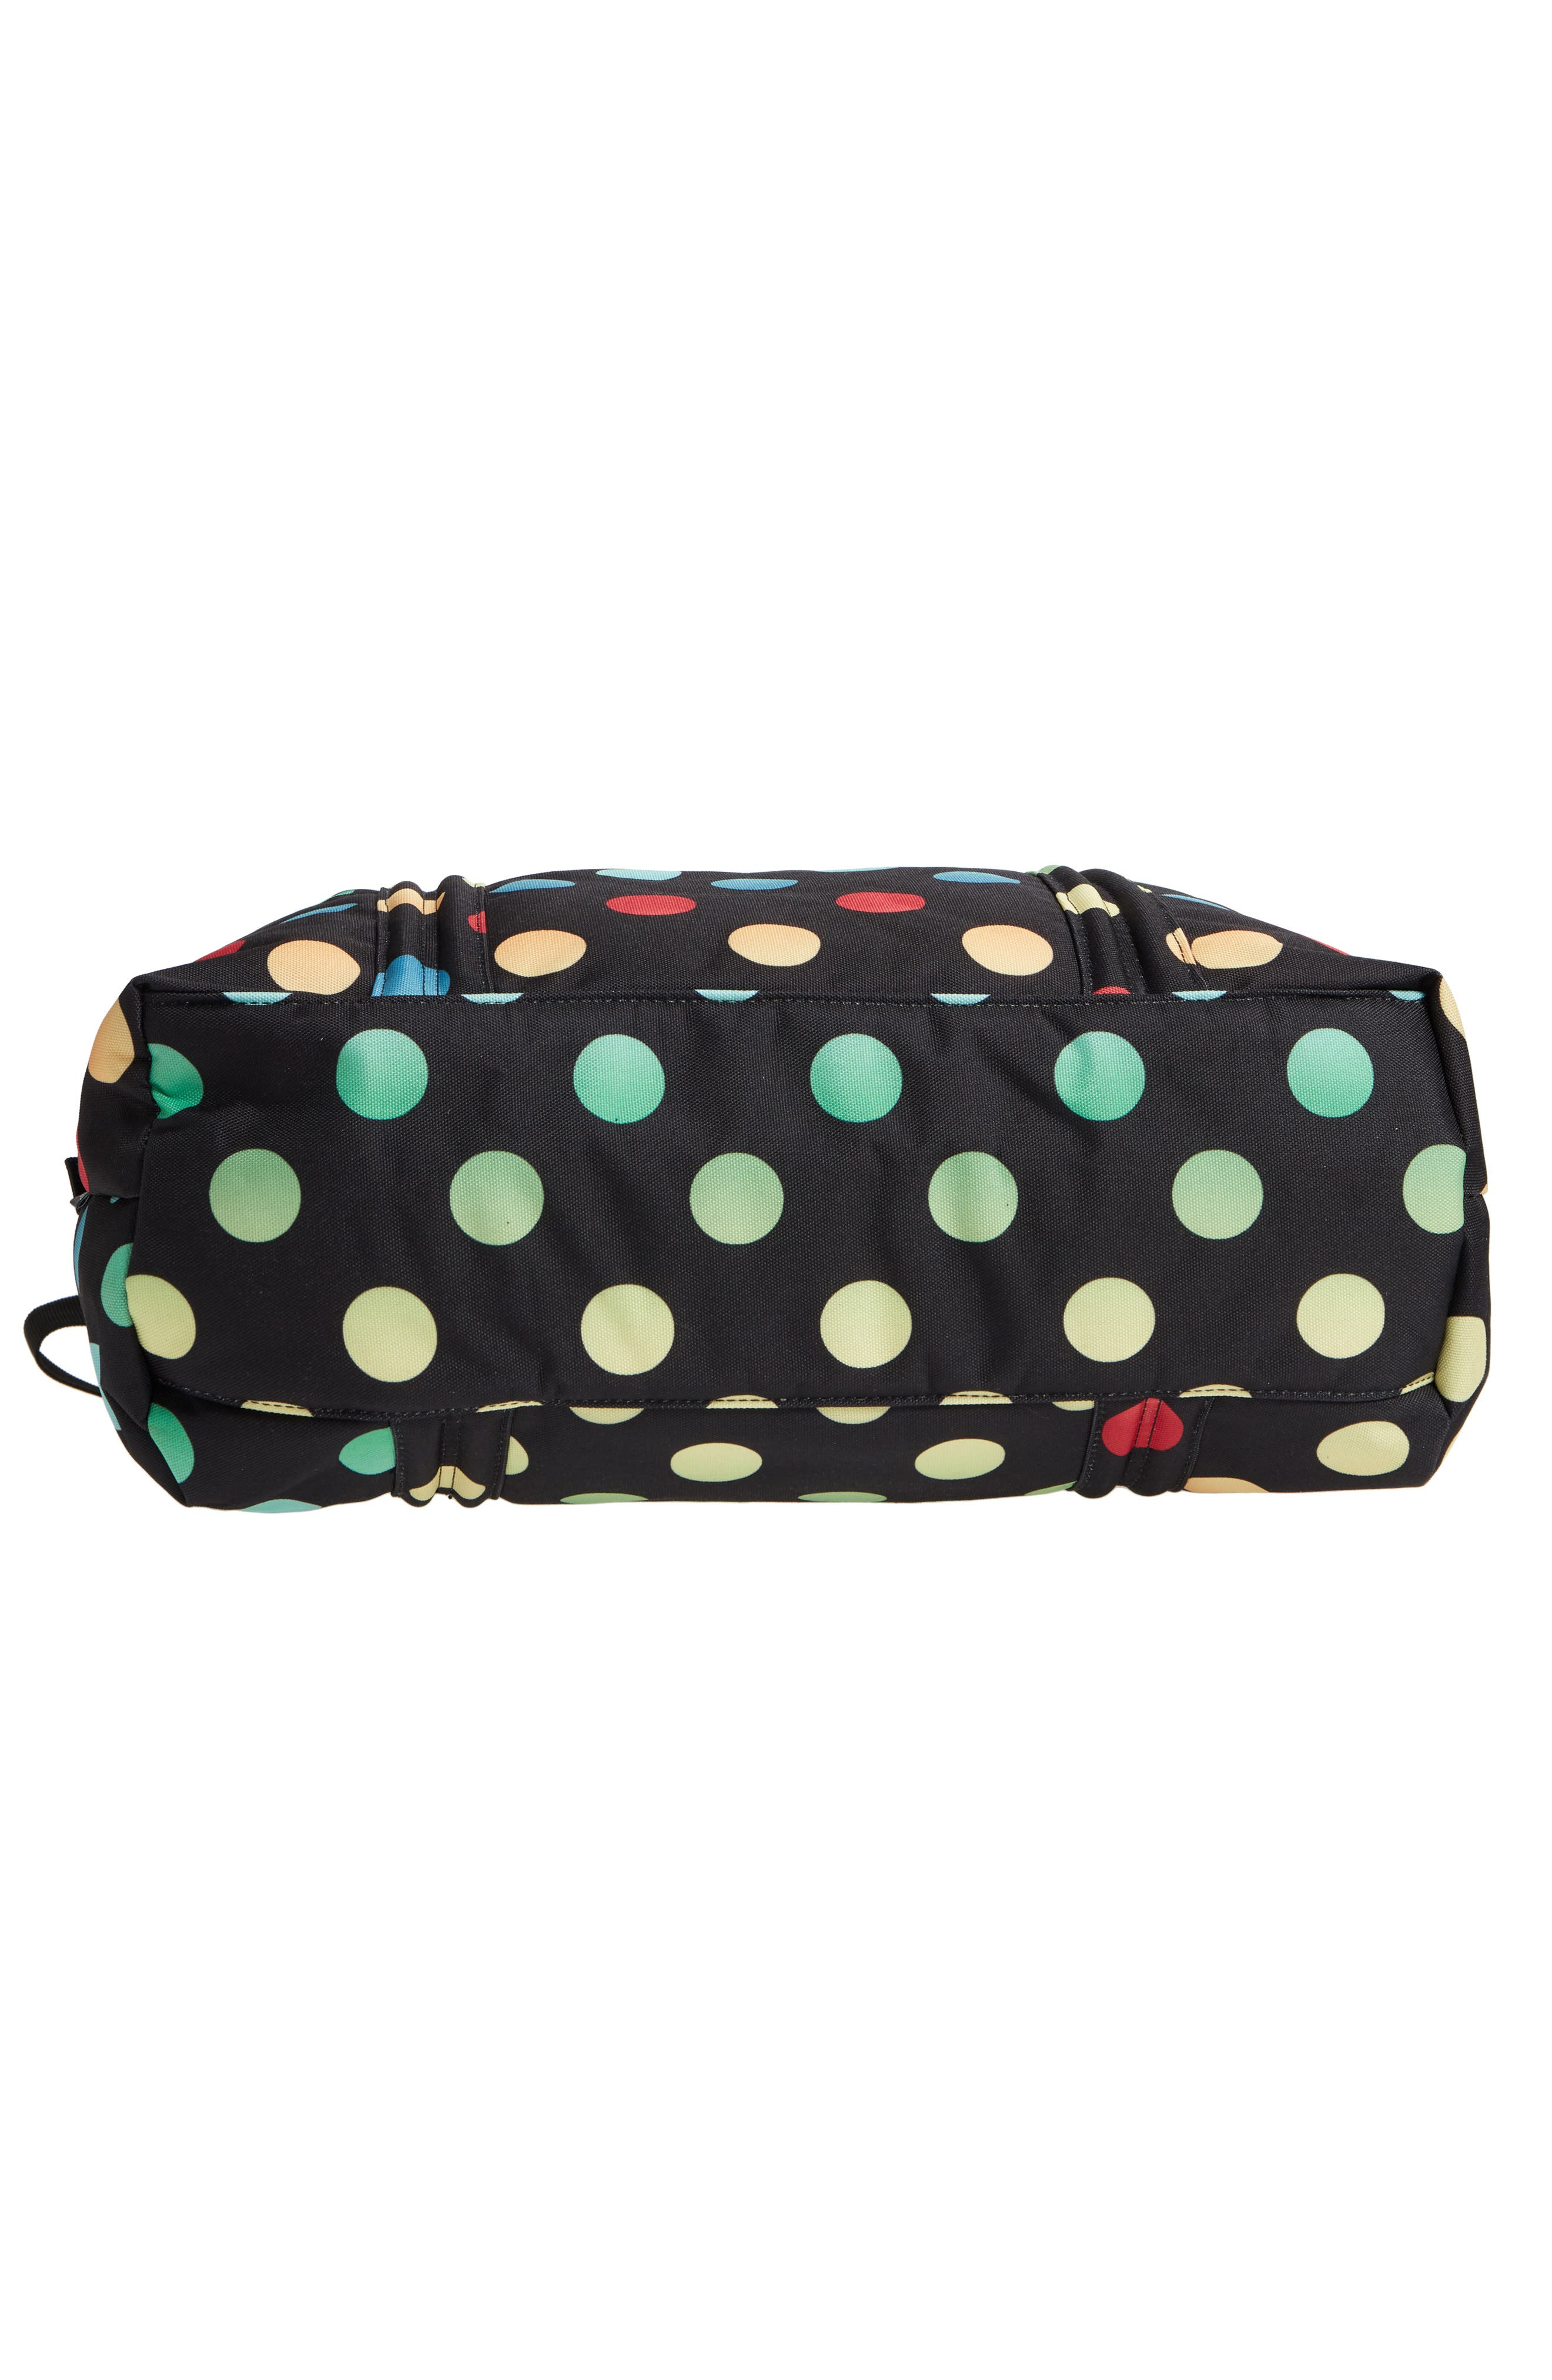 Sprout Diaper Bag,                             Alternate thumbnail 6, color,                             Black Rainbow